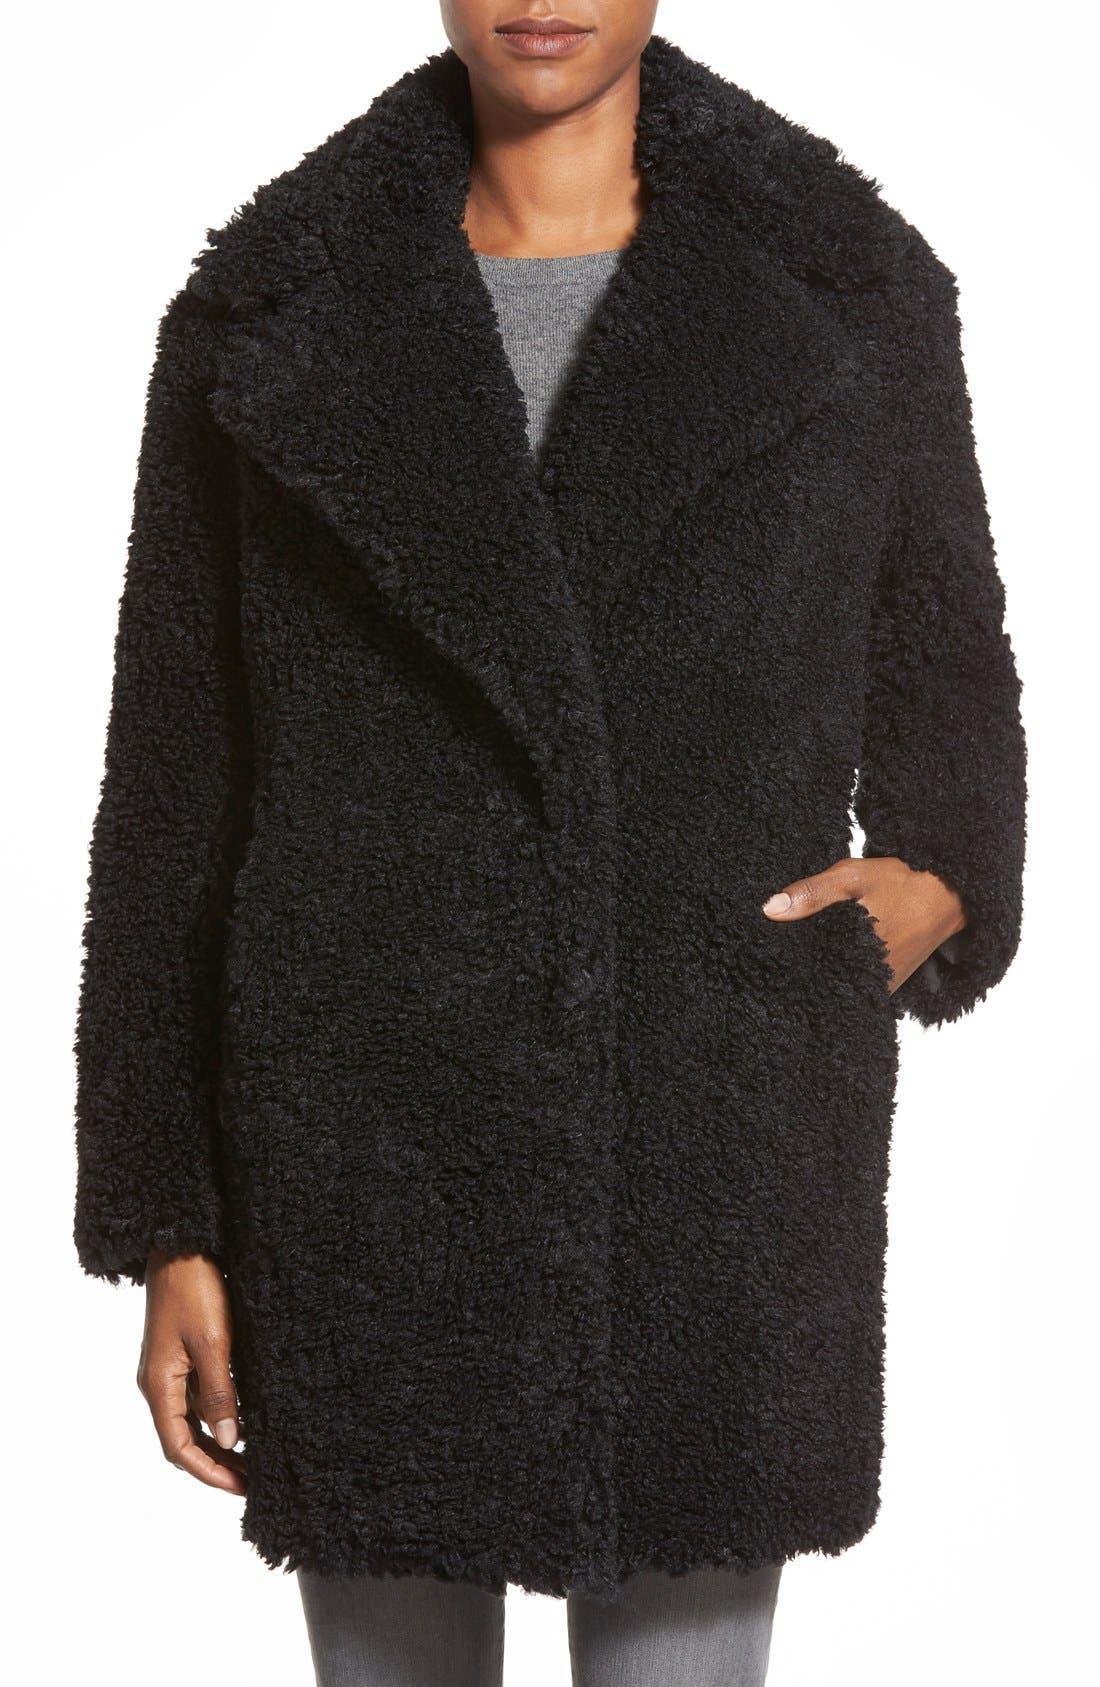 KENSIE 'Teddy Bear' Notch Collar Reversible Faux Fur Coat, Main, color, 001